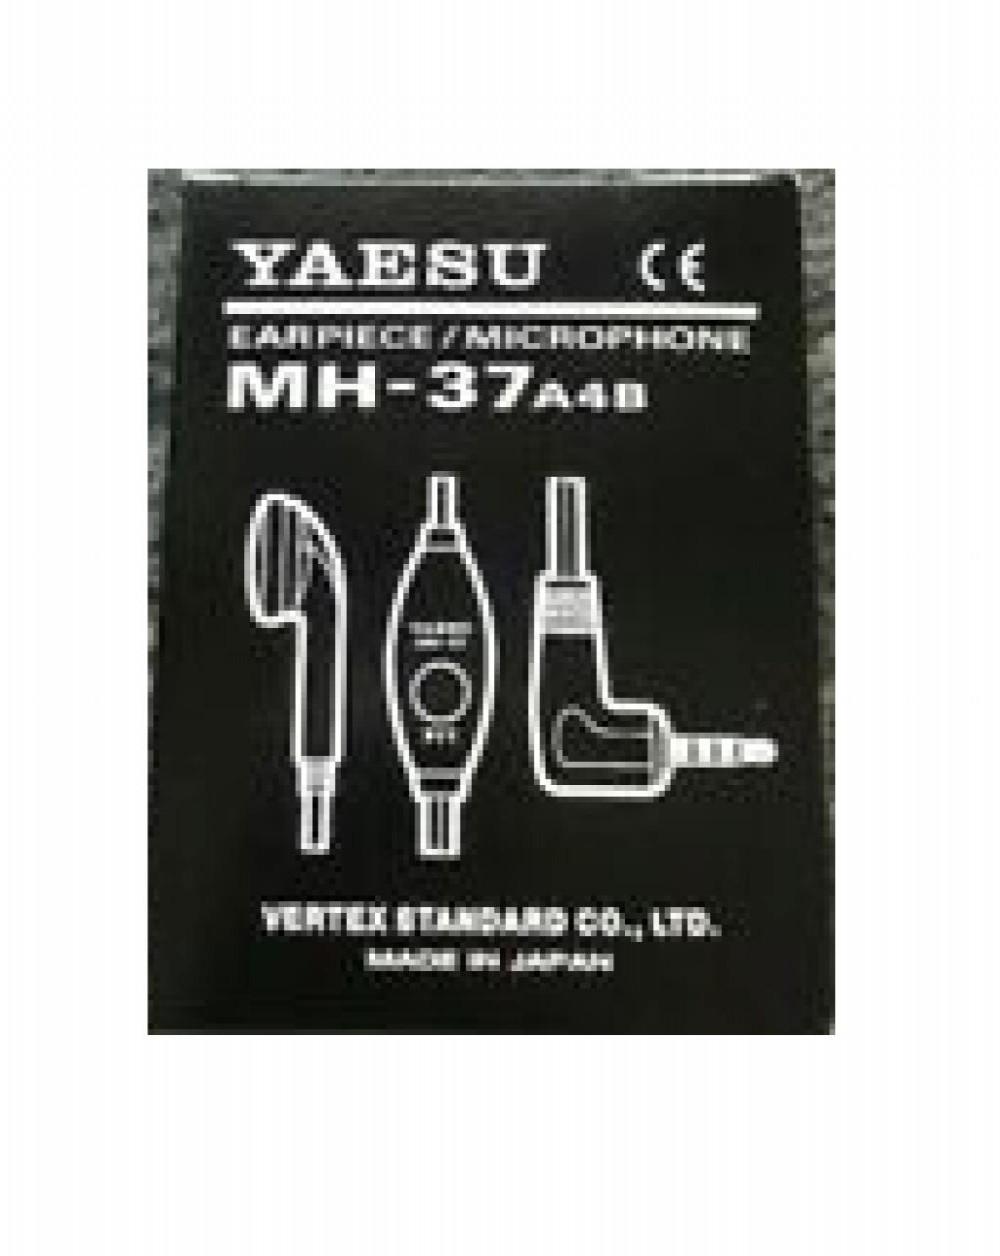 YAESU MICROFONE MH-37A4B (VX-150)